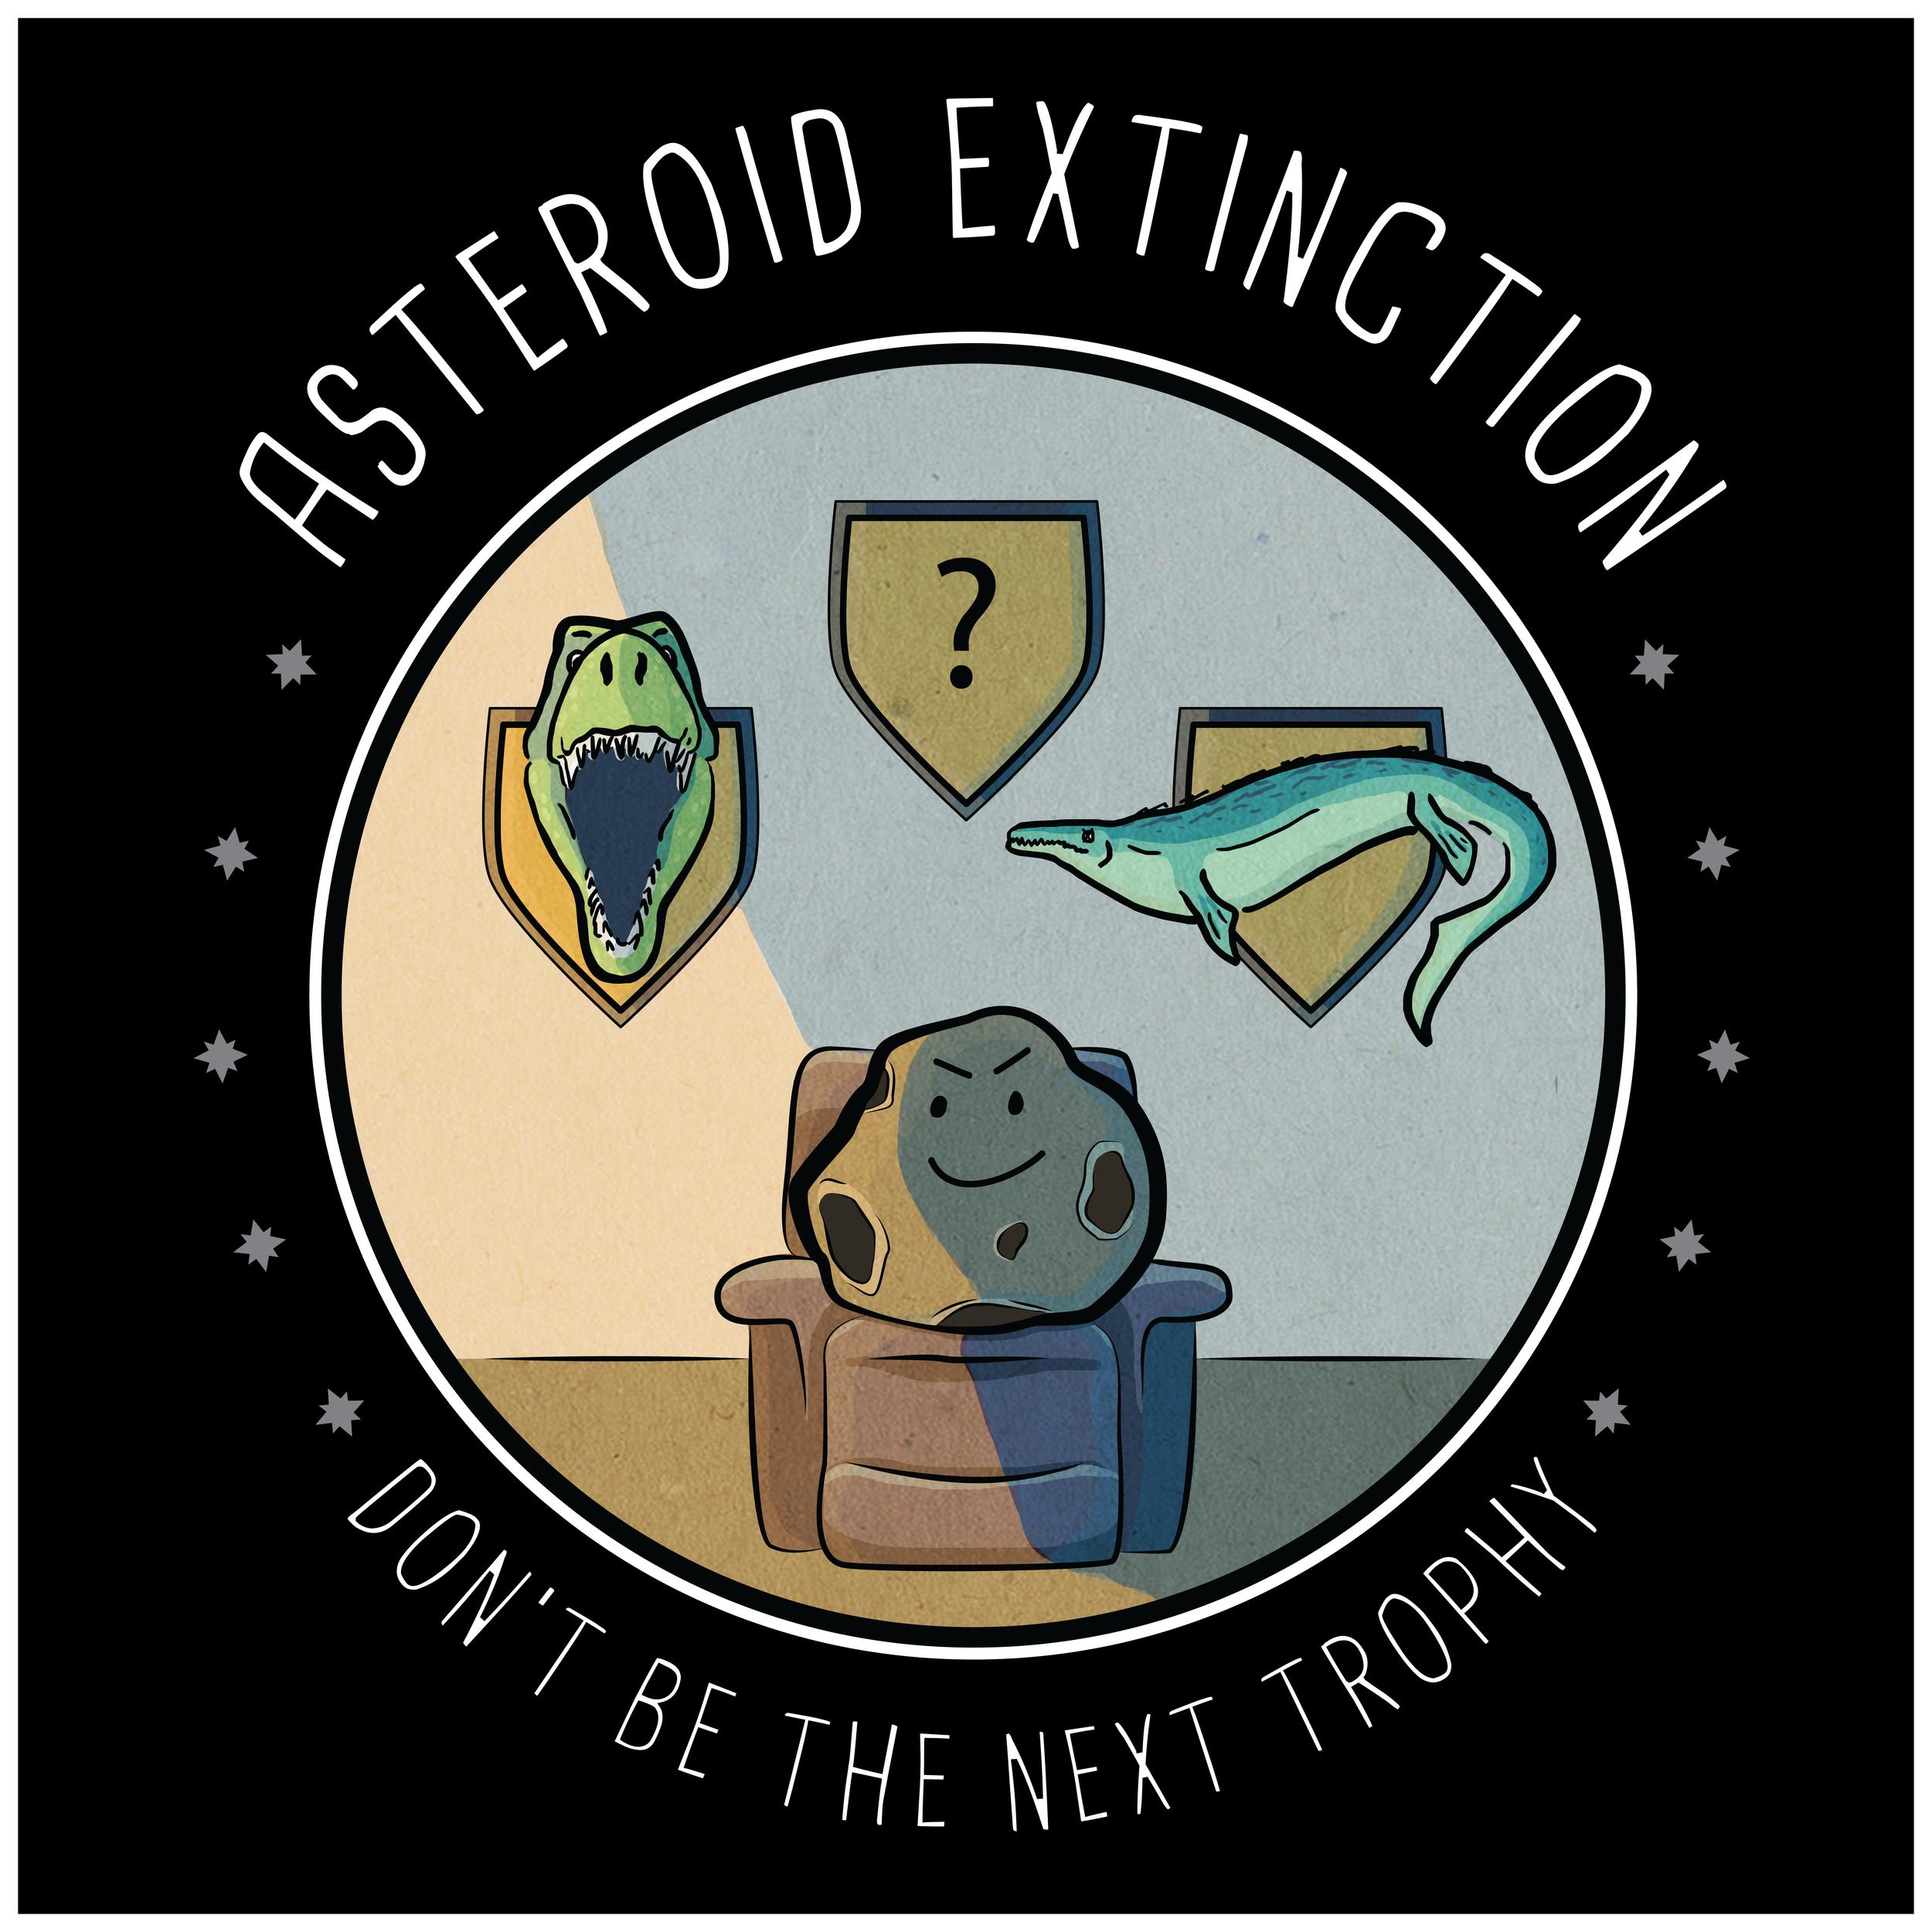 Asteroid Extinction